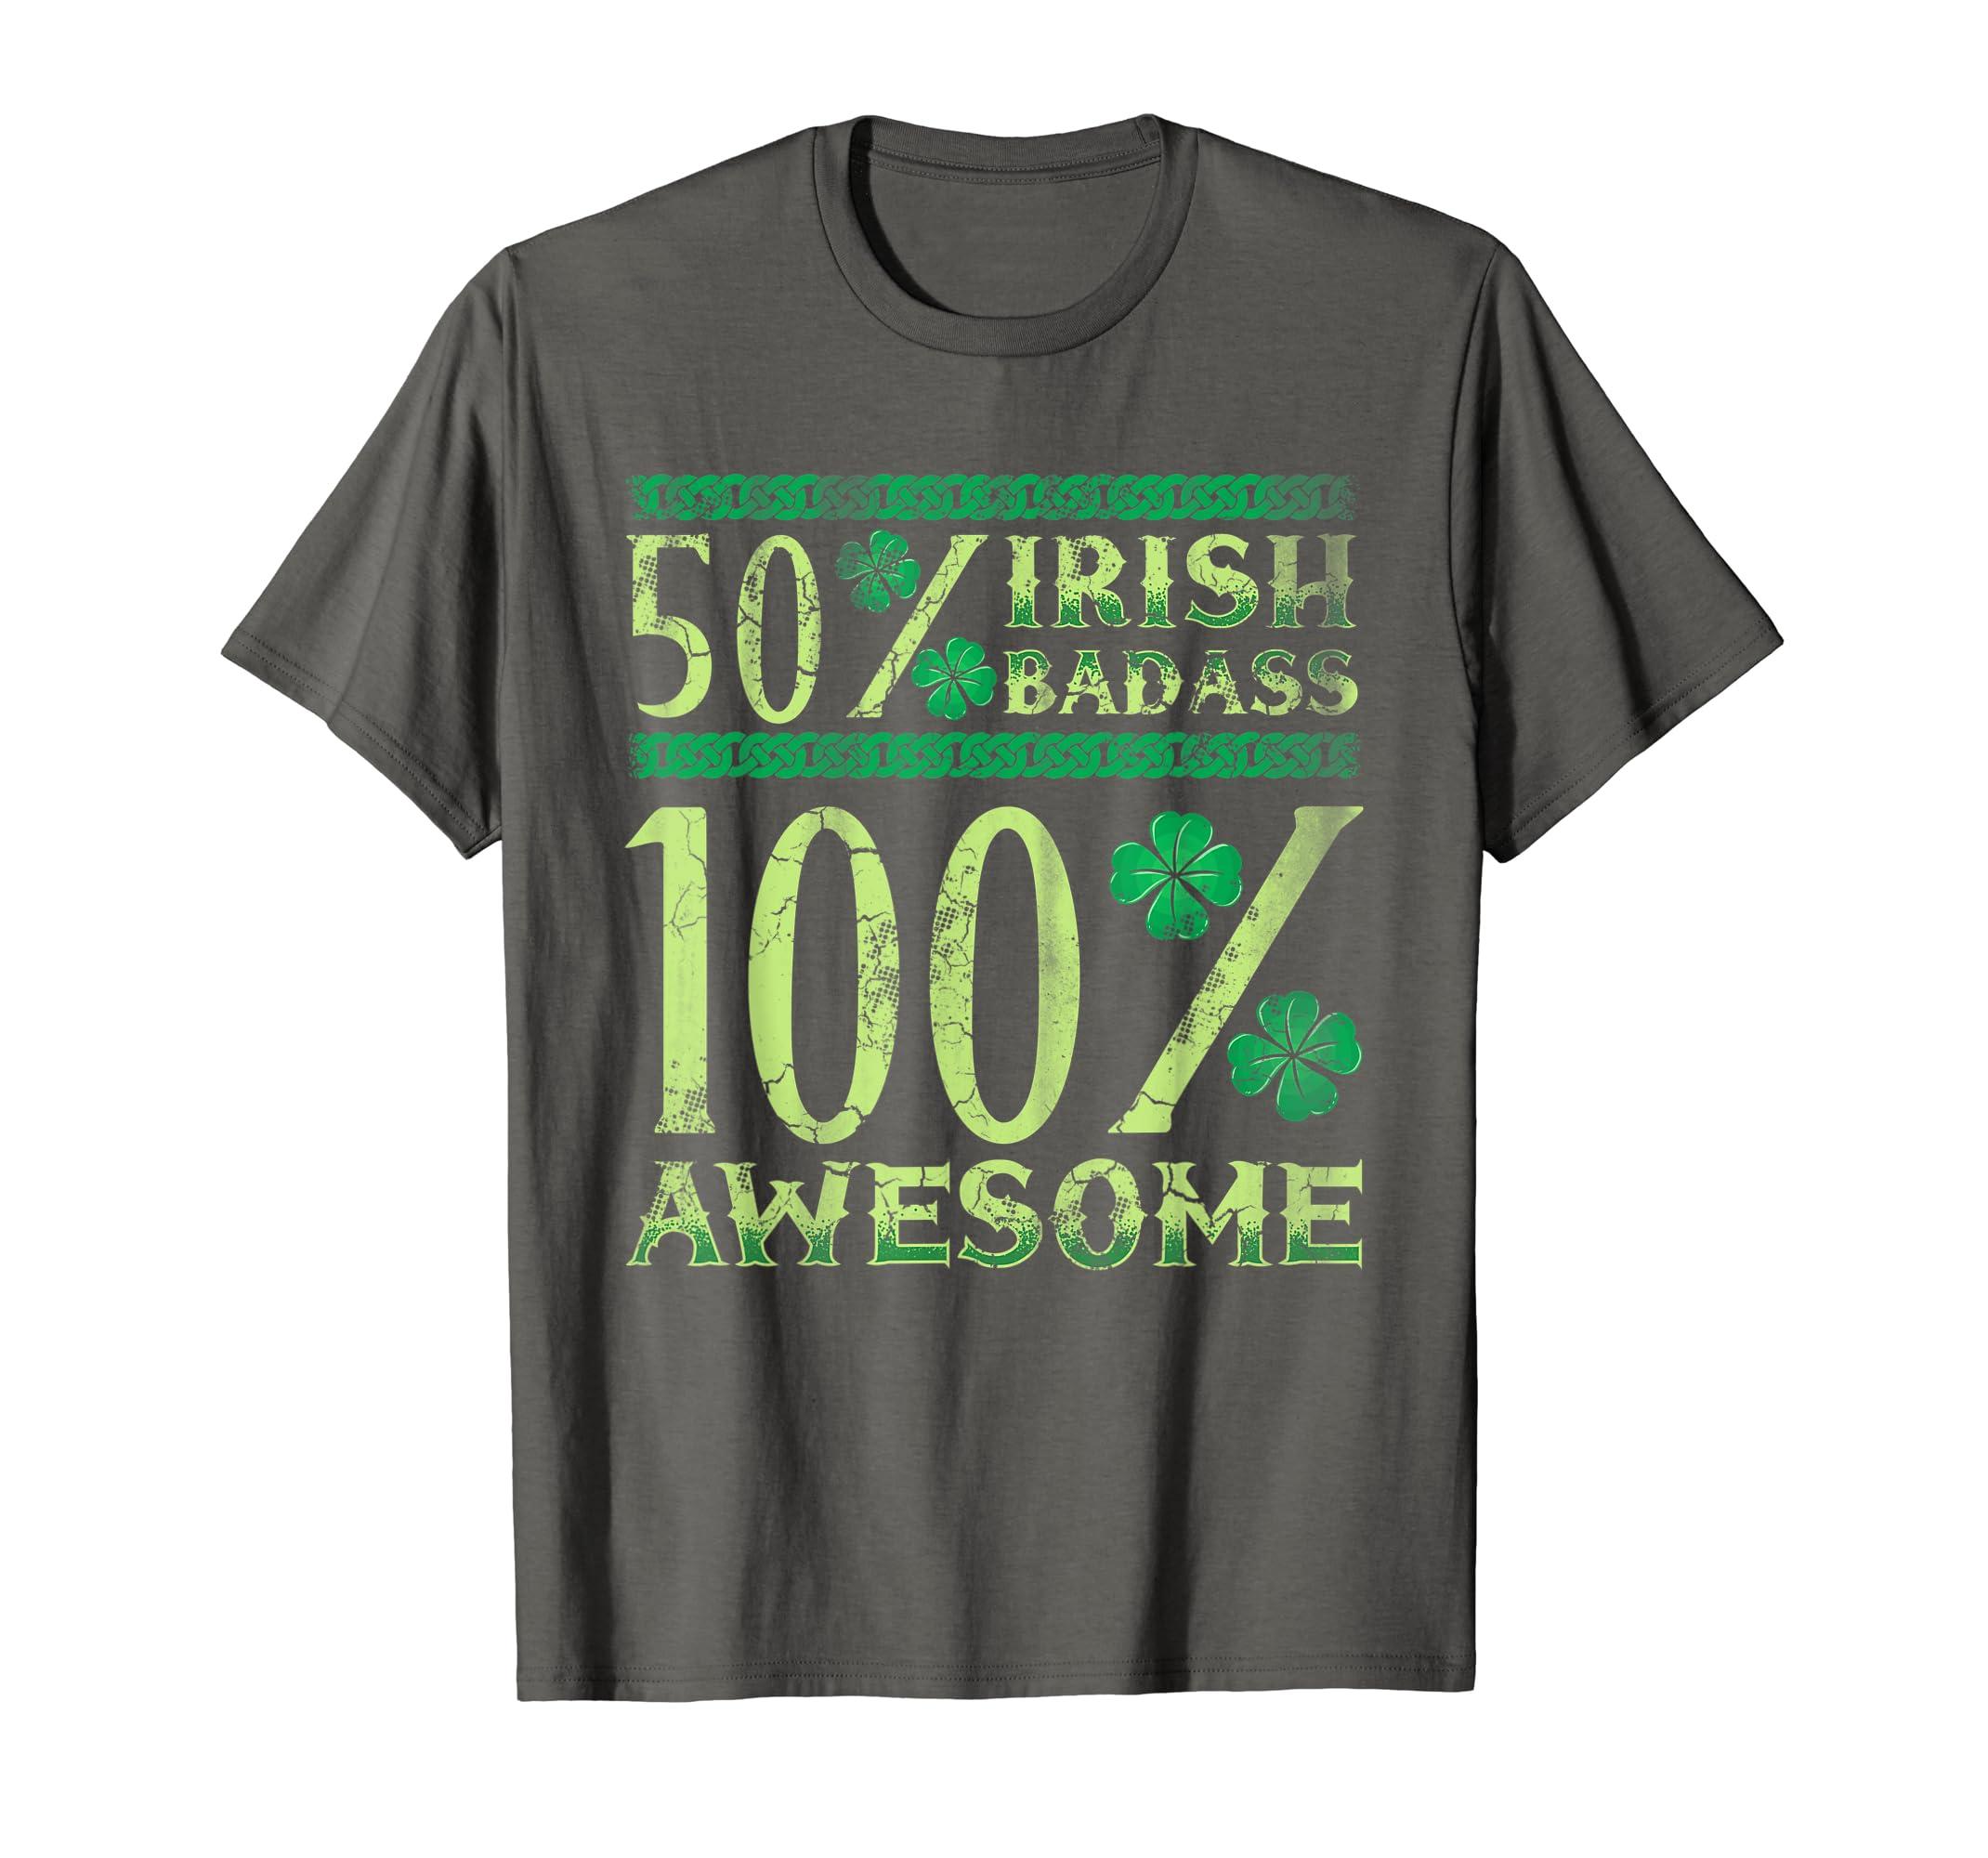 00c40a7a Amazon.com: 50% Irish Badass 100% Awesome T-Shirt St Patricks Day: Clothing